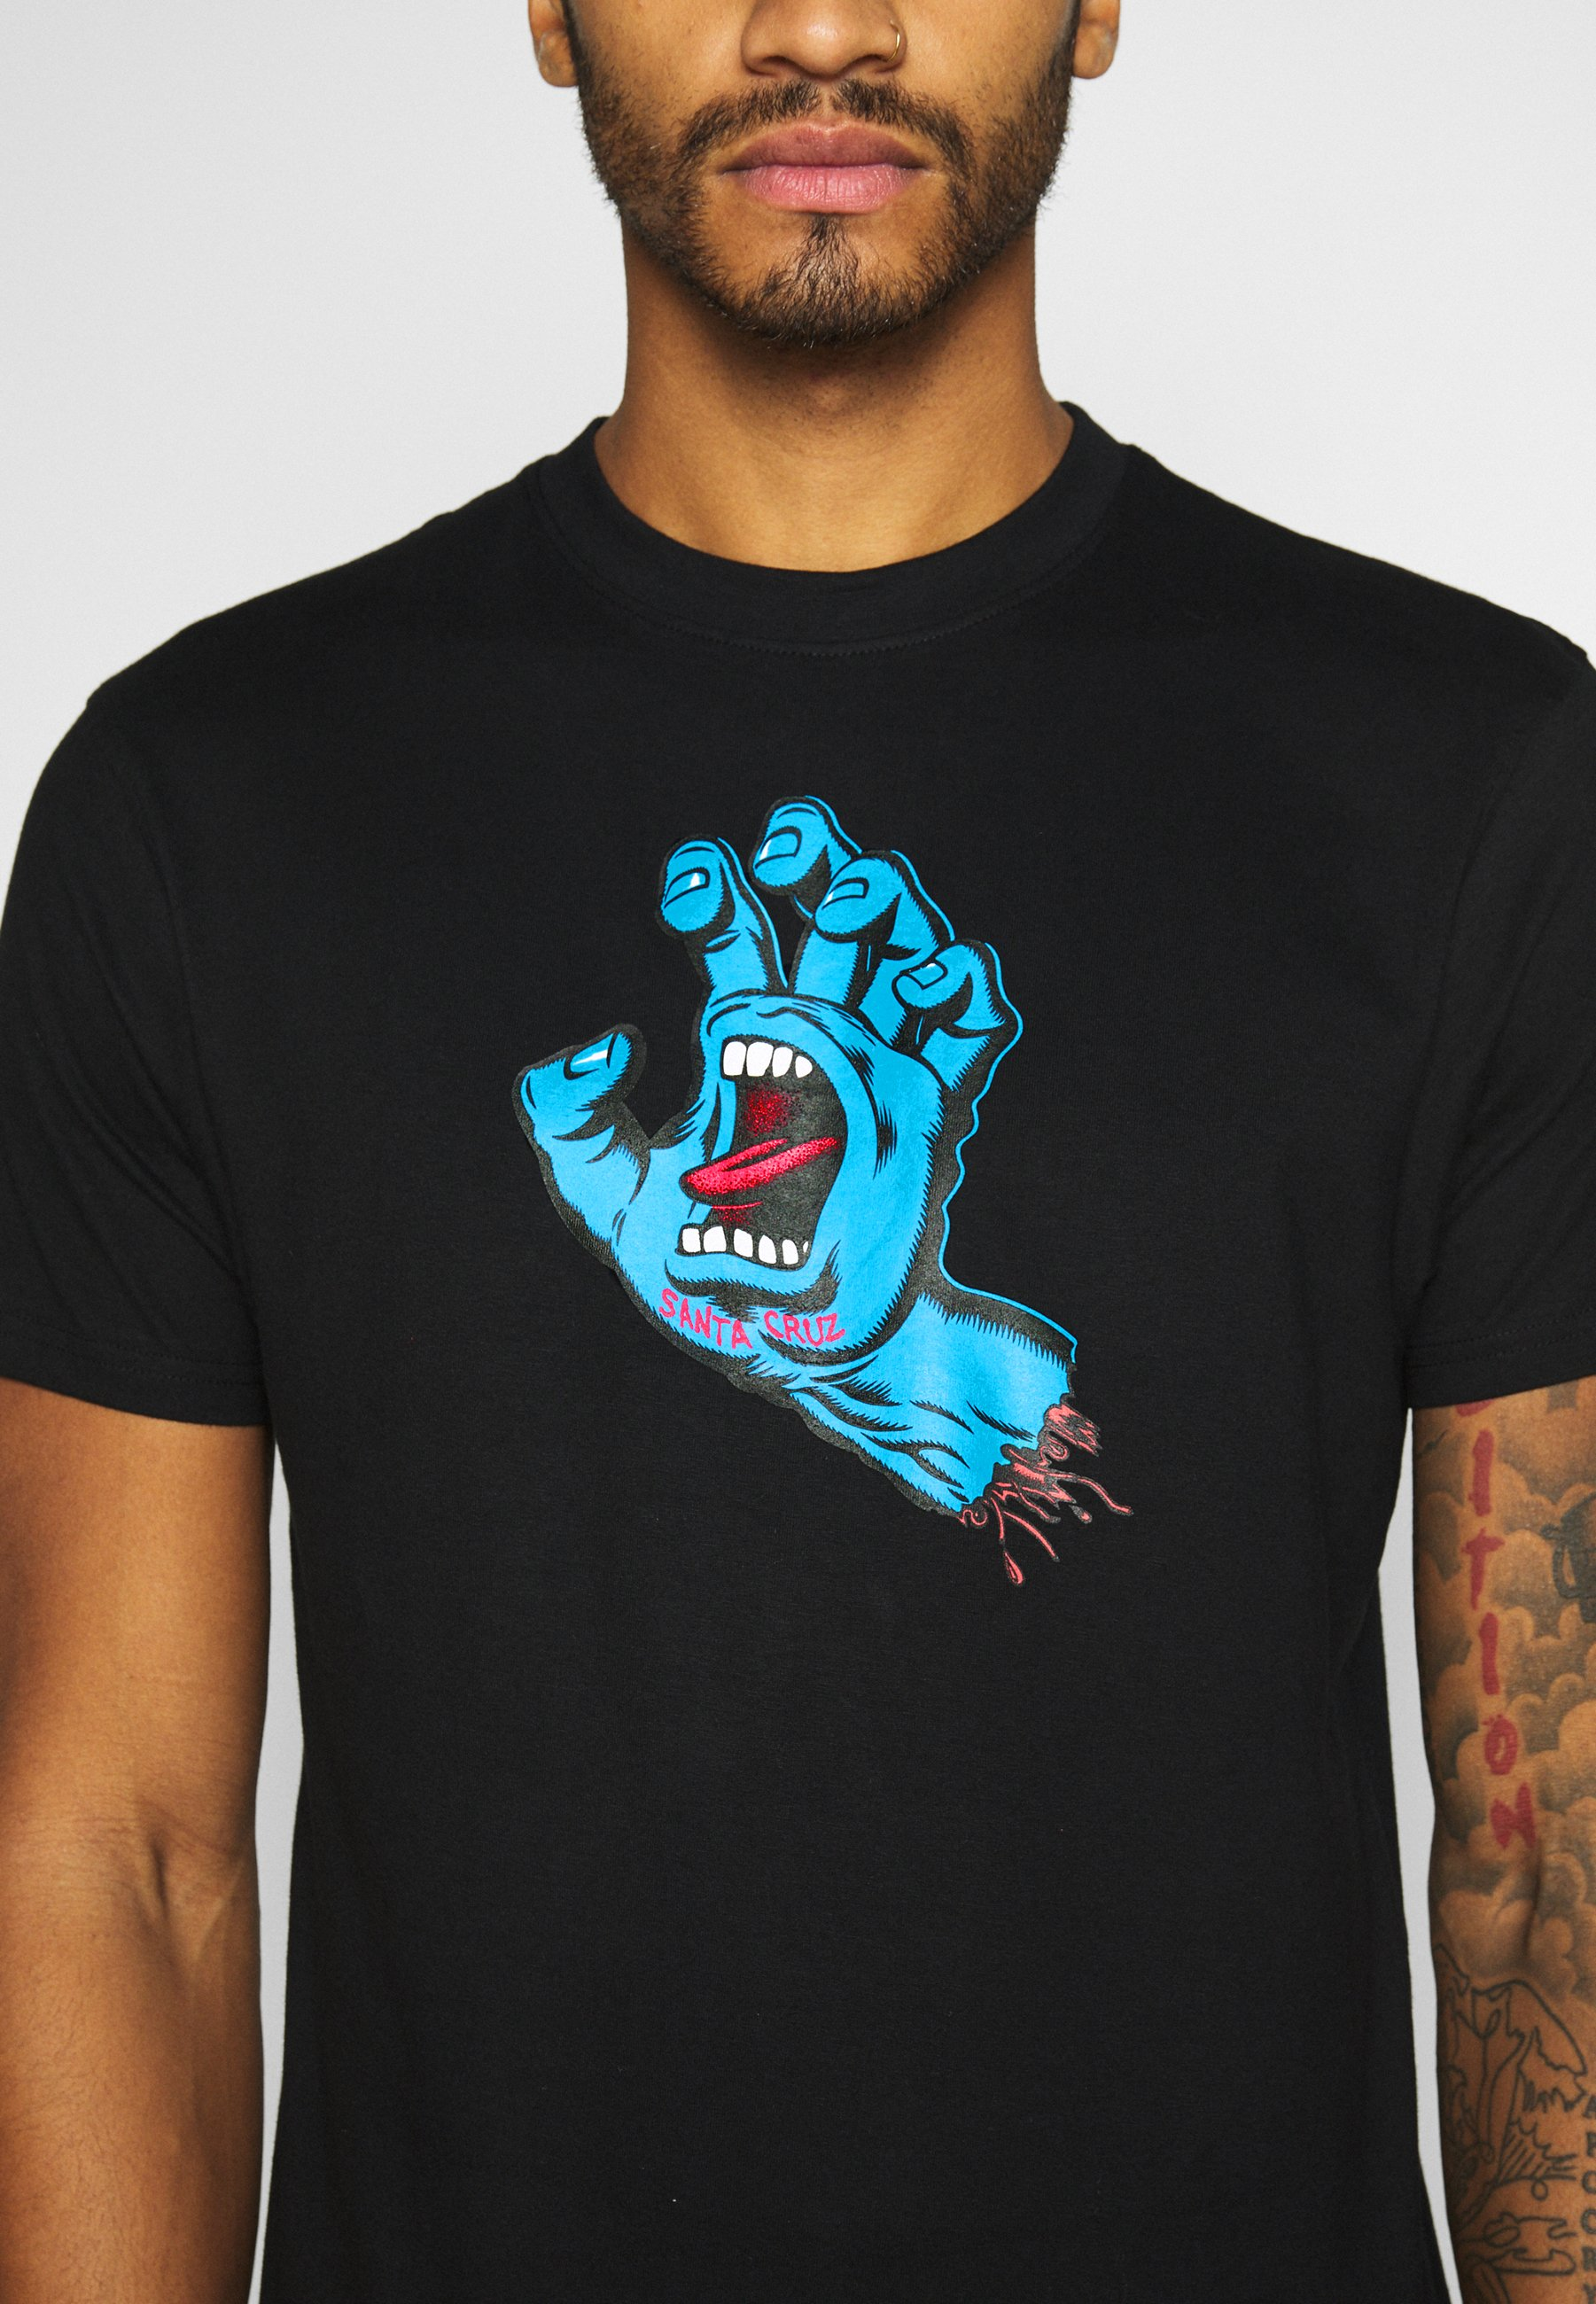 Uomo unisex Screaming hand - T-shirt con stampa